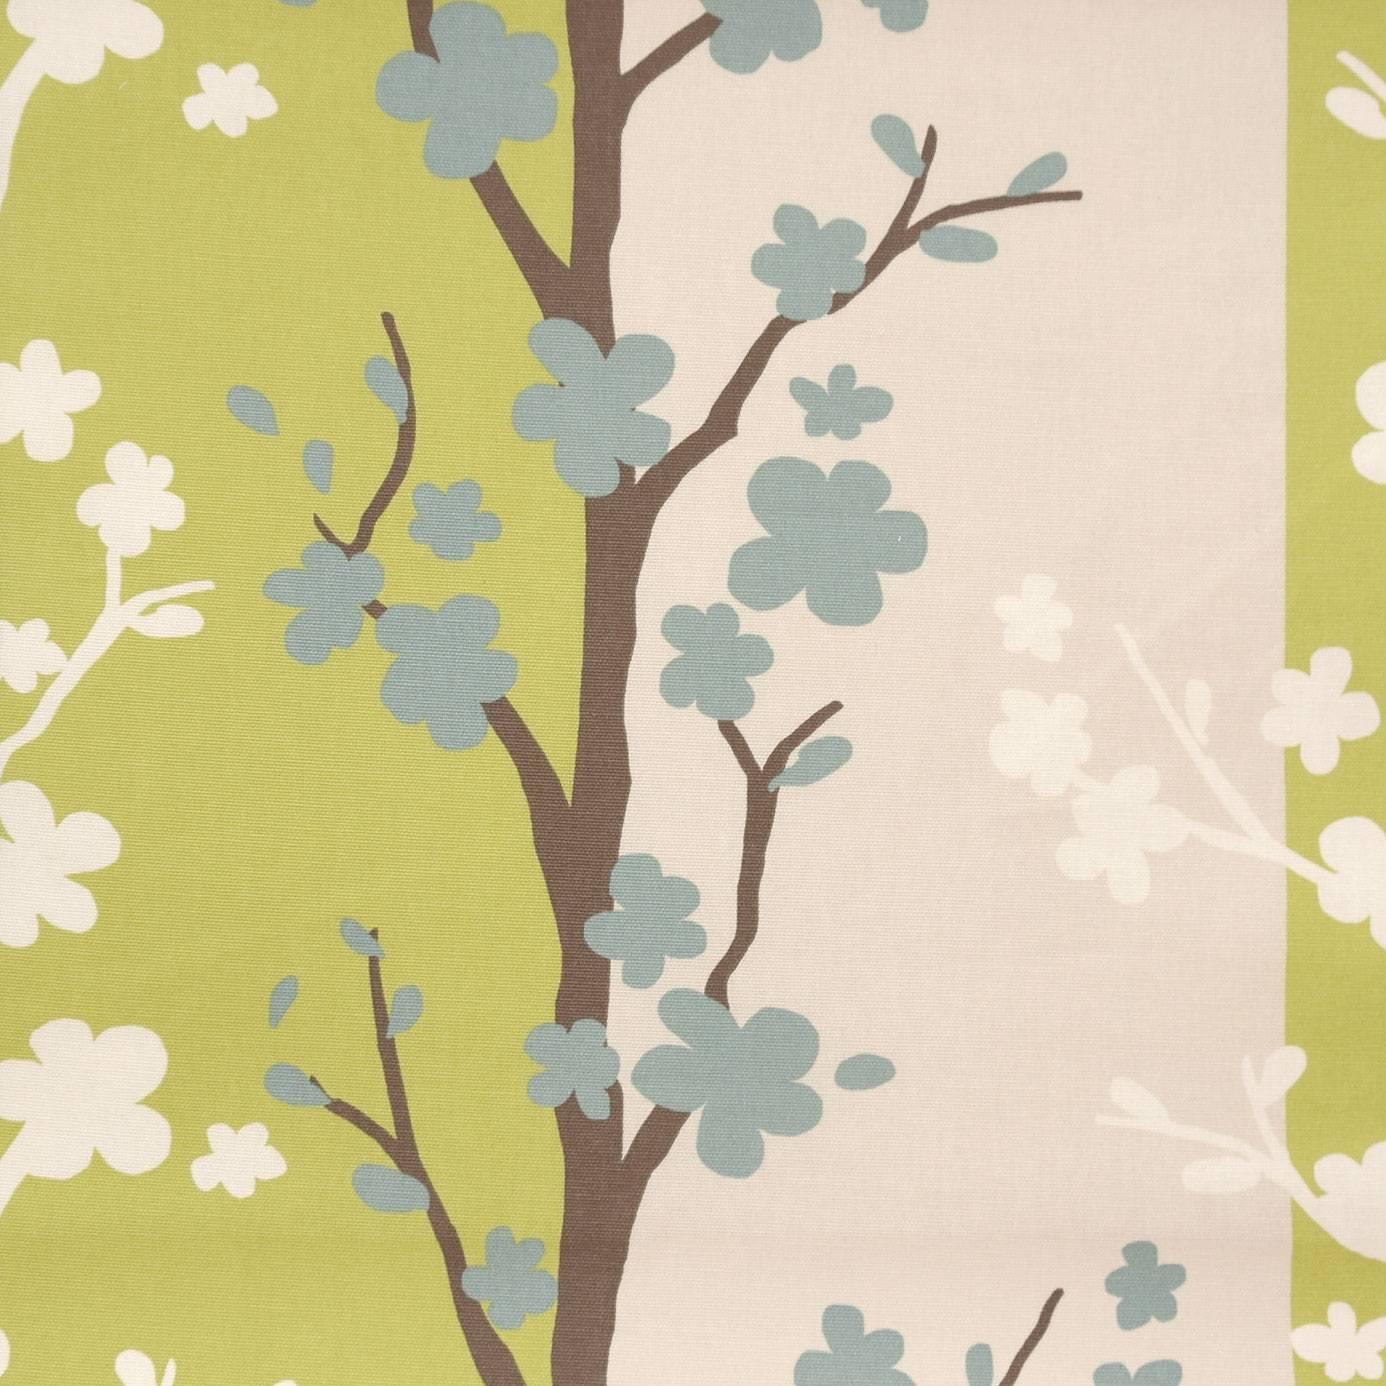 Curtains in Blomma Fabric  Wasabi (F032806)  Studio G Scandia Fabrics Coll # Wasbak Fabriek_155207